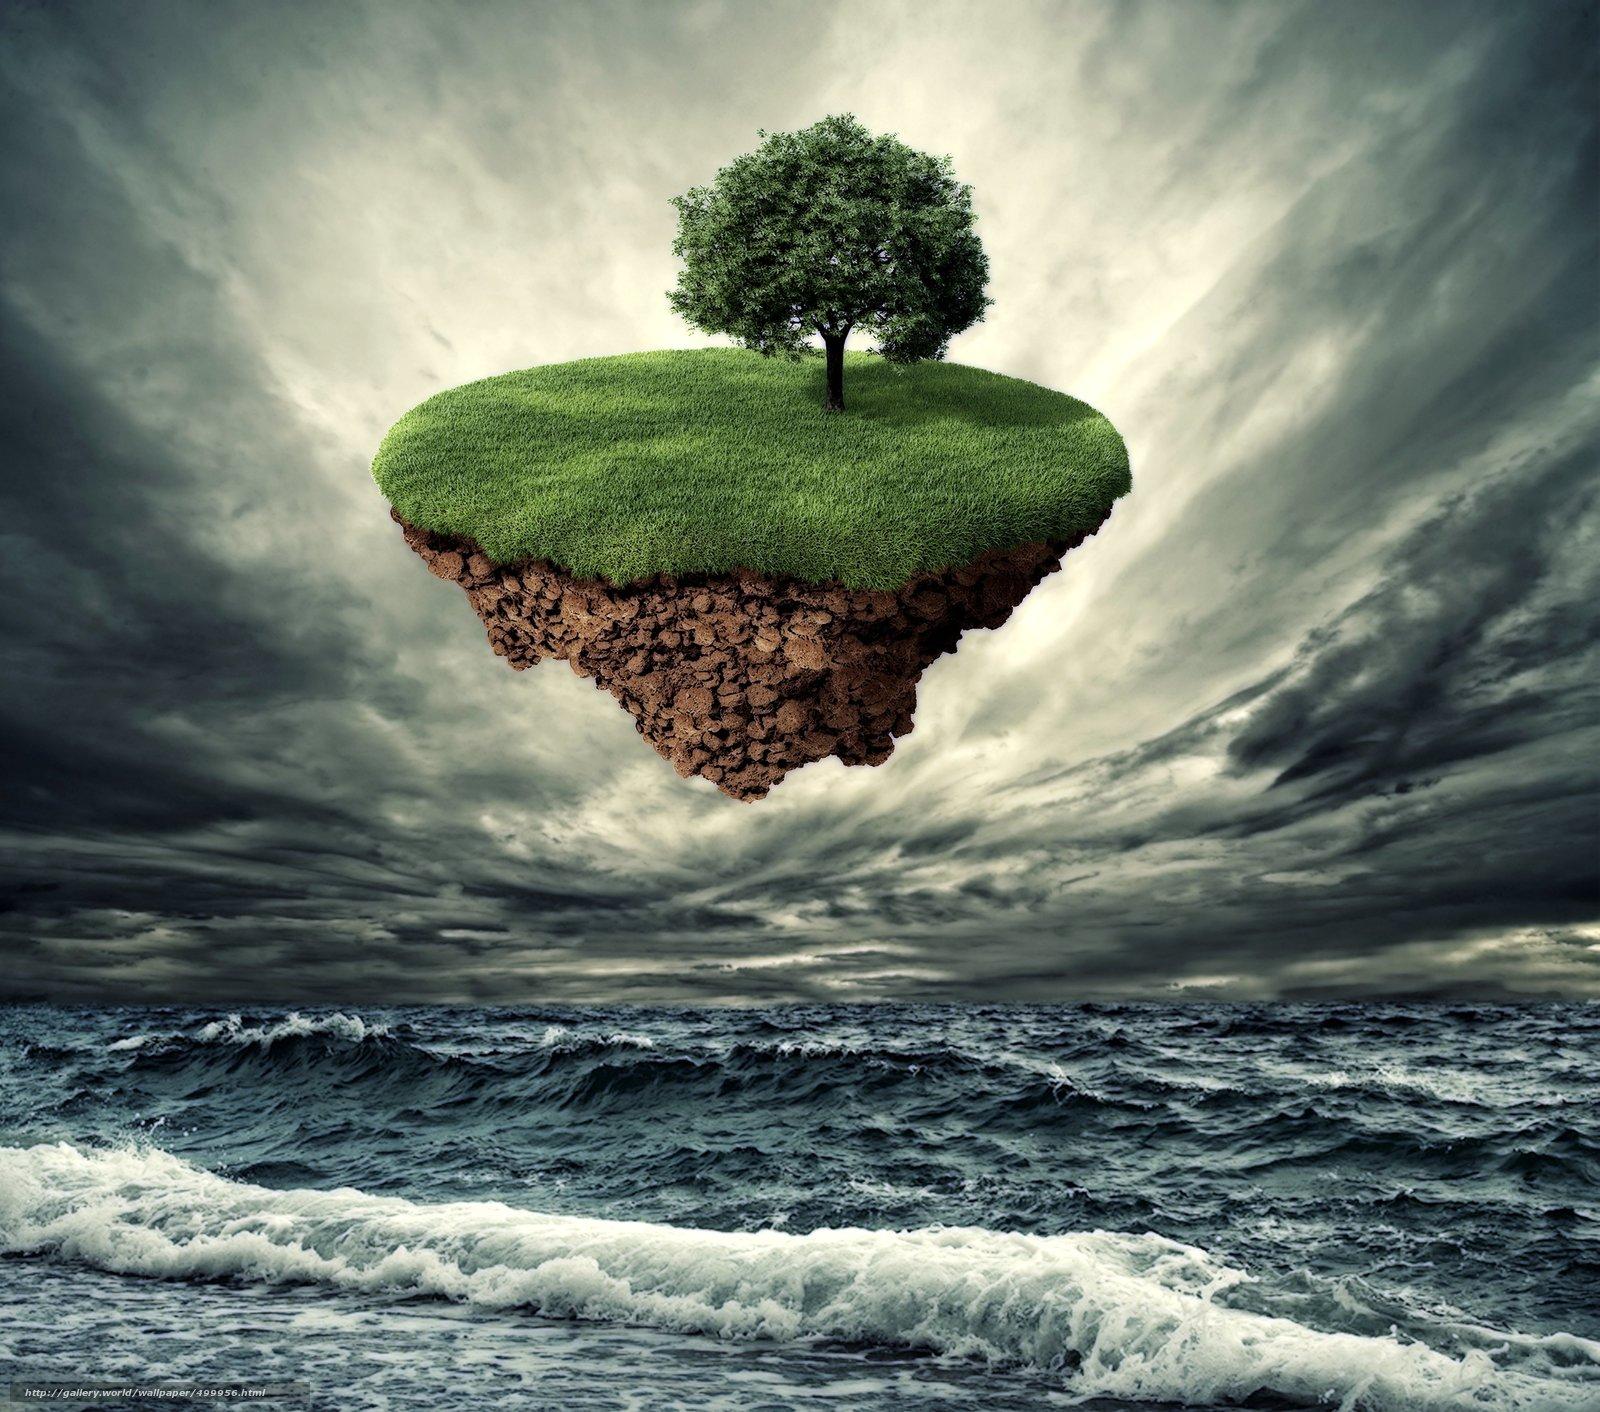 island 3d picture wallpaper - photo #11